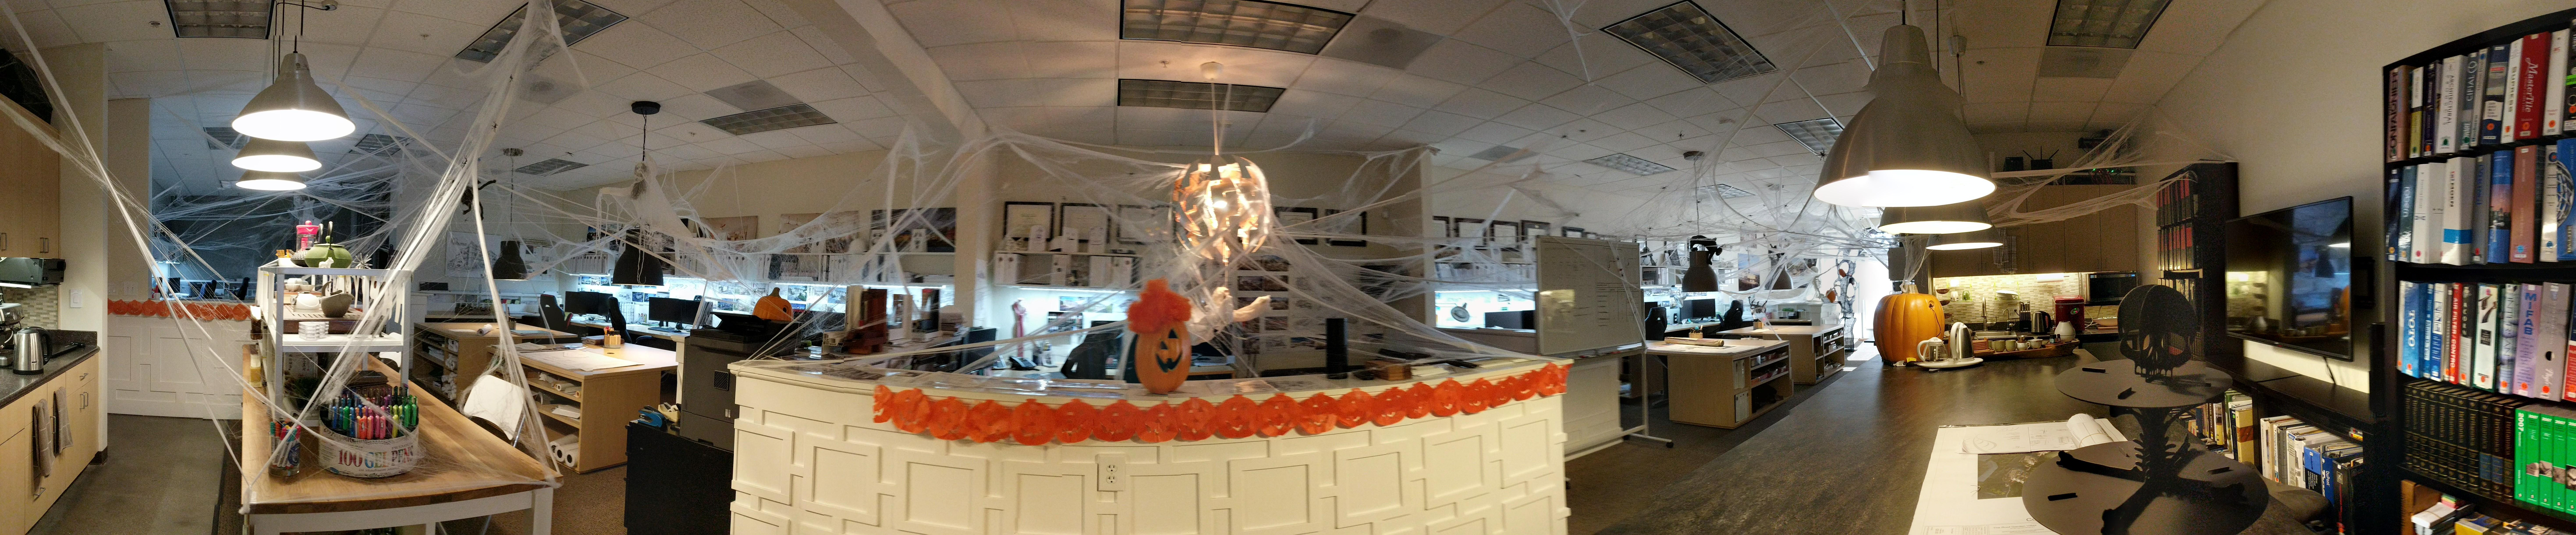 Halloween @ Gkw Architects!